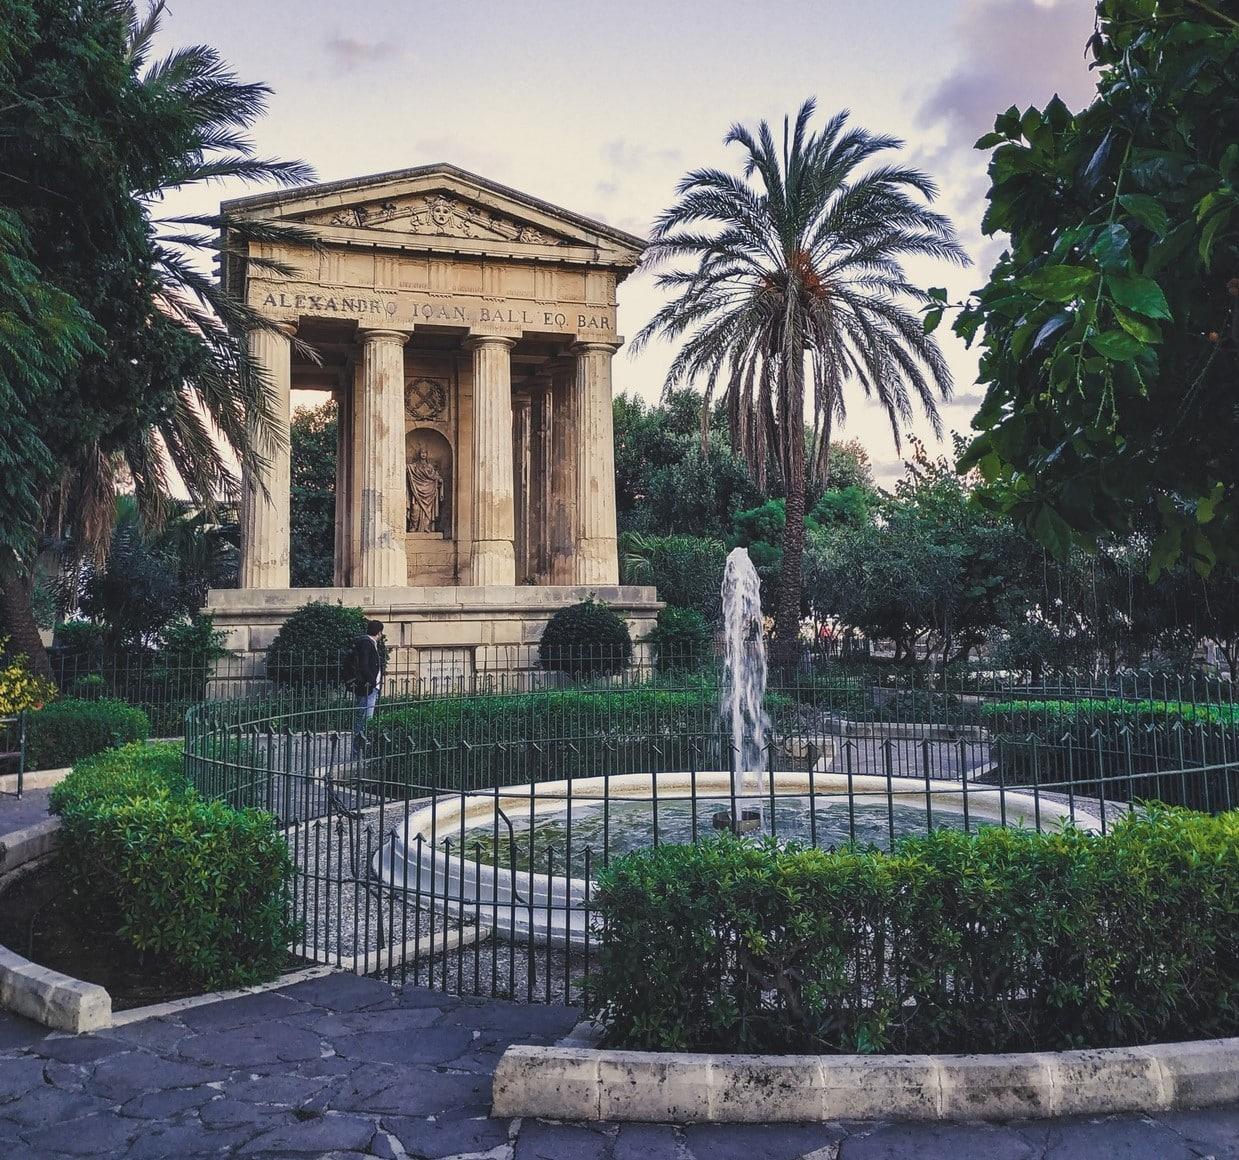 Malta Tour from Gozo to Rabat and Mdina 9